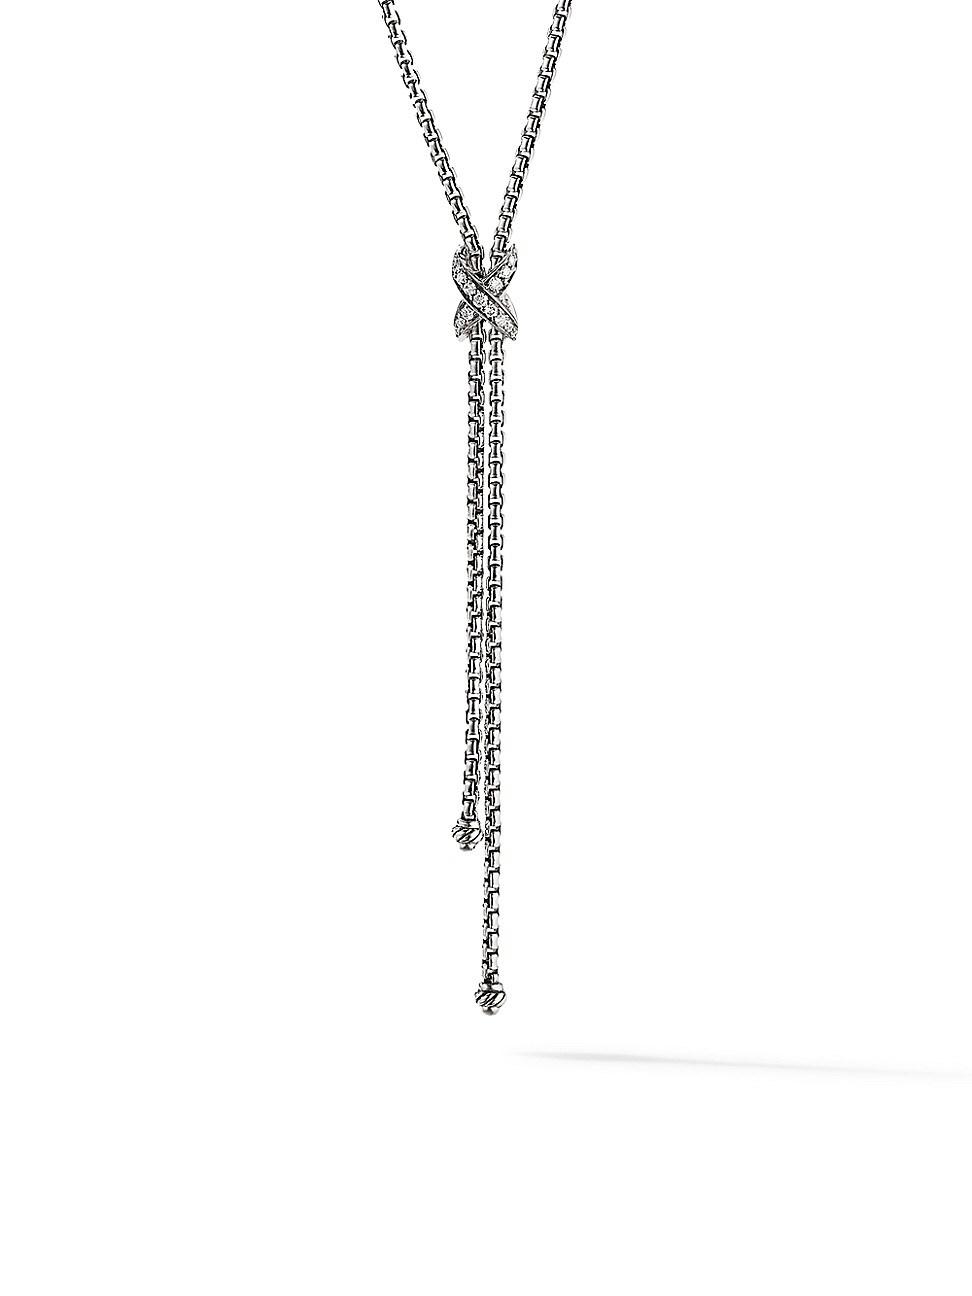 David Yurman WOMEN'S PETITE X LARIAT Y NECKLACE WITH PAVÉ DIAMONDS